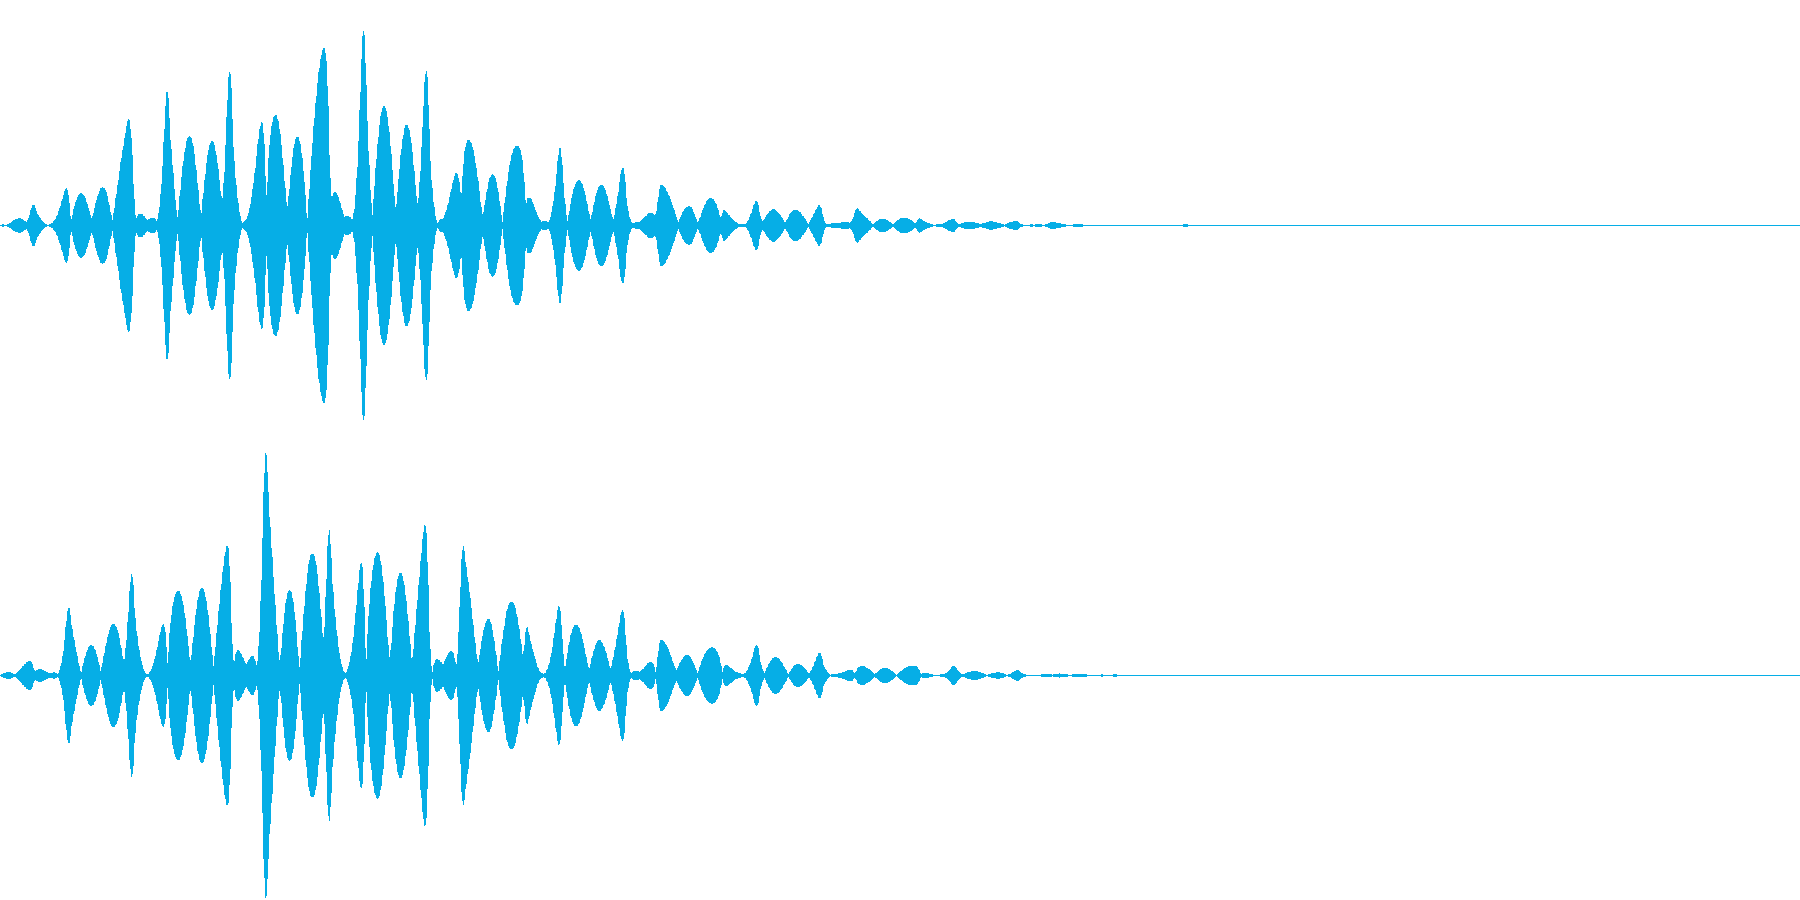 FX 幽霊の効果音 揺れる SE 1の再生済みの波形